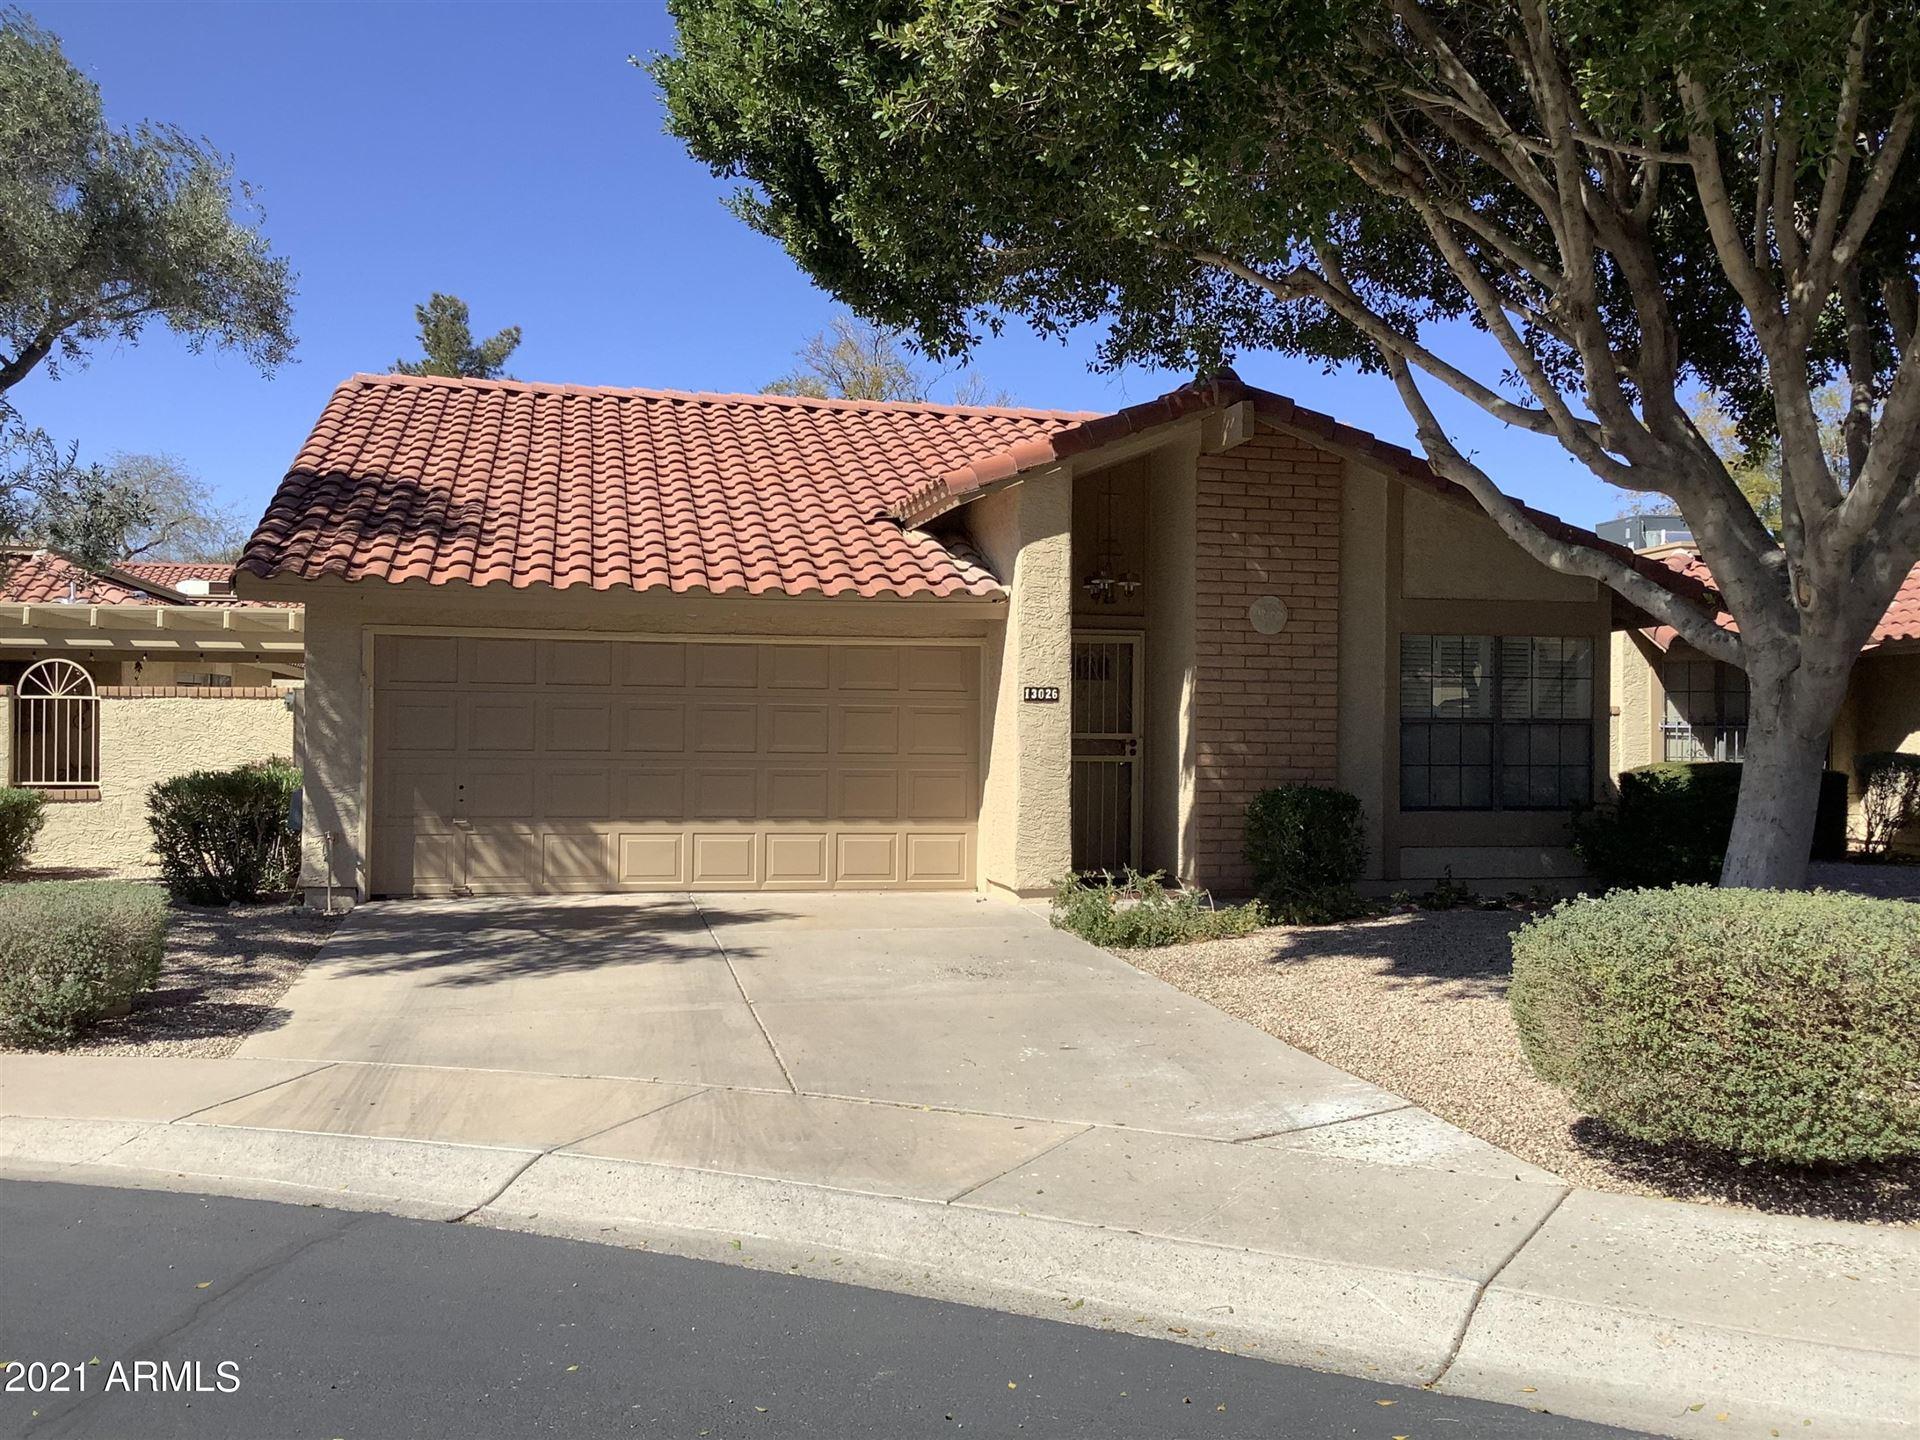 Photo of 13026 S 44TH Way, Phoenix, AZ 85044 (MLS # 6200658)